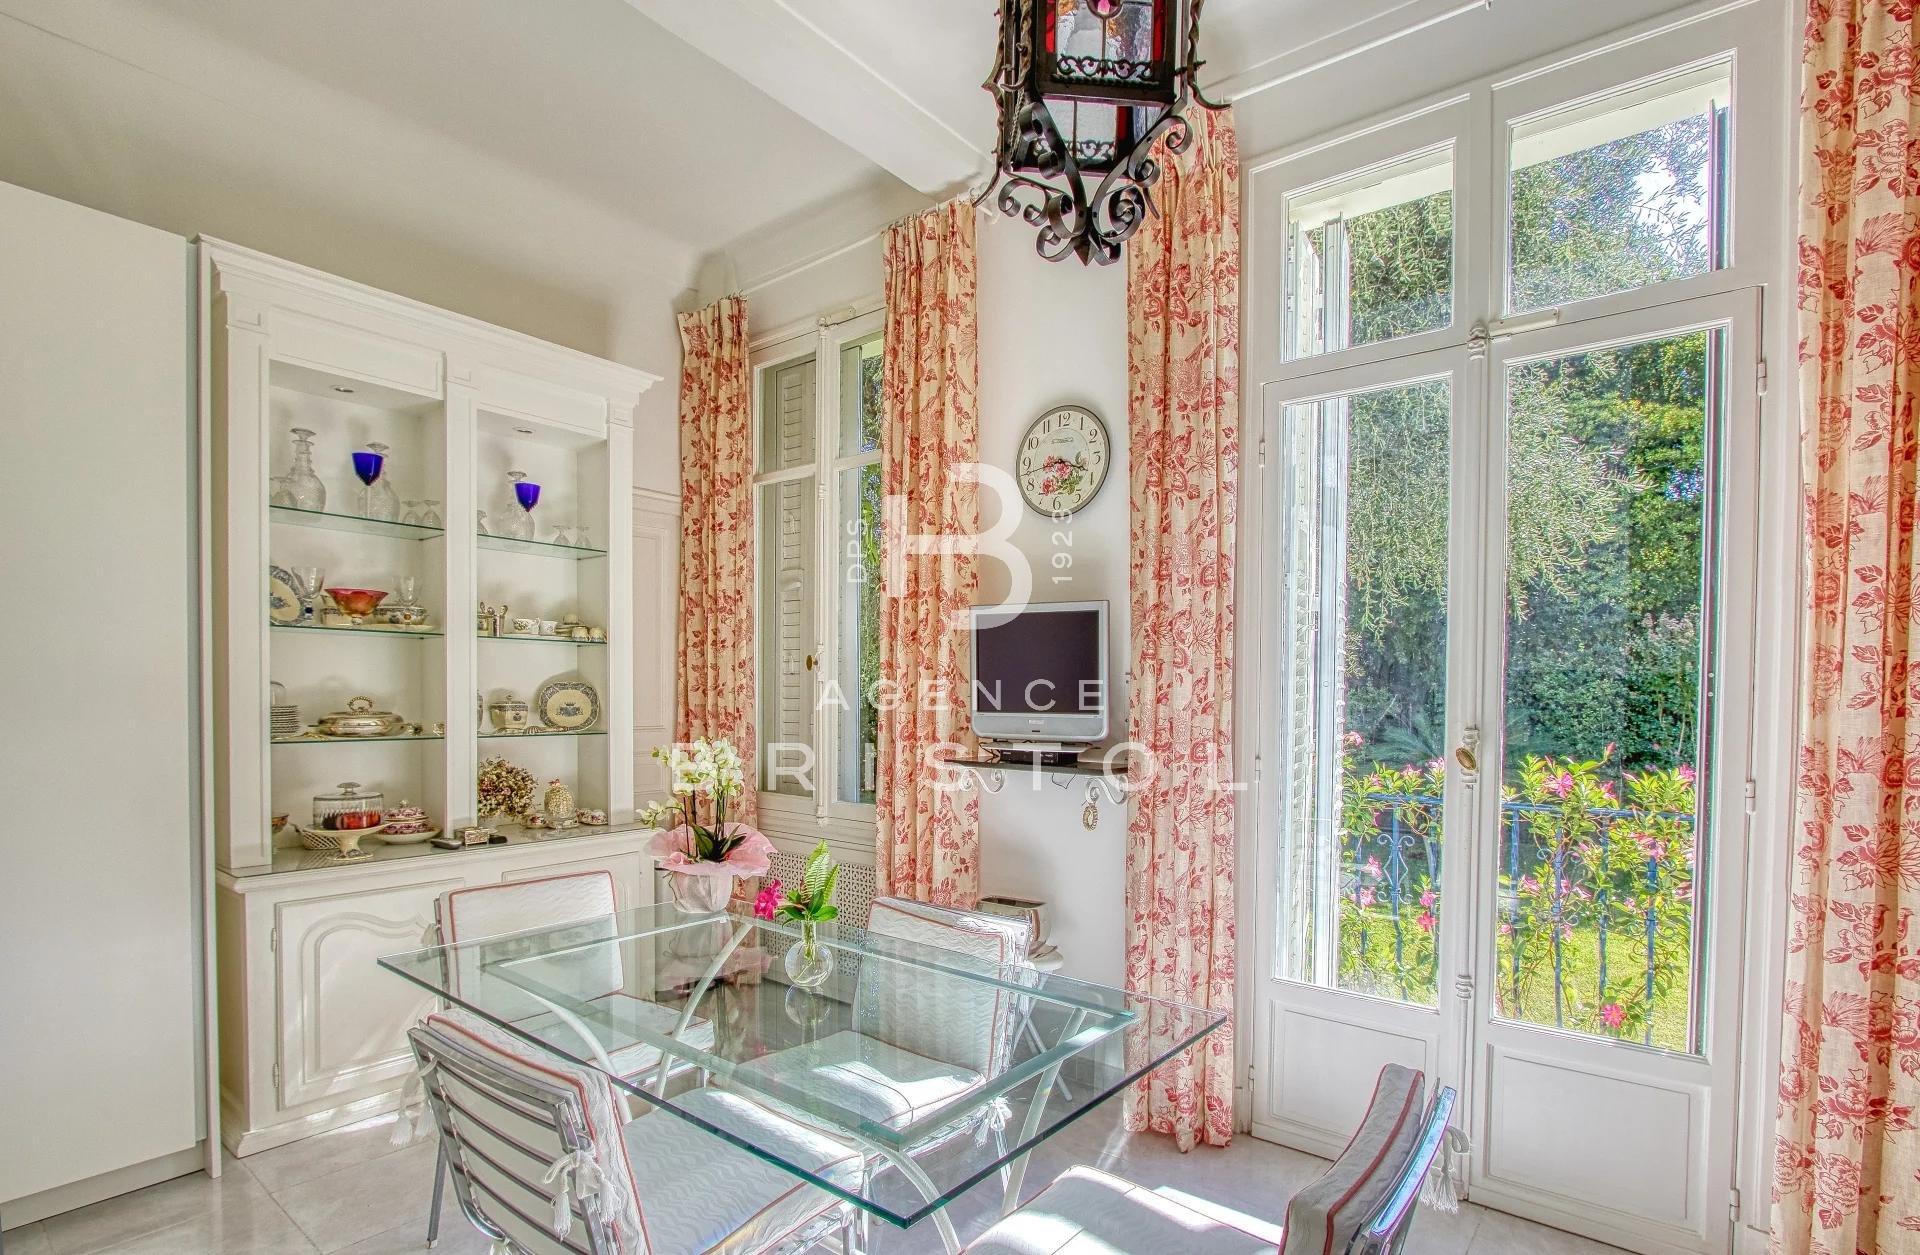 Magnificent Belle Epoque style villa in the heart of Beaulieu sur Mer